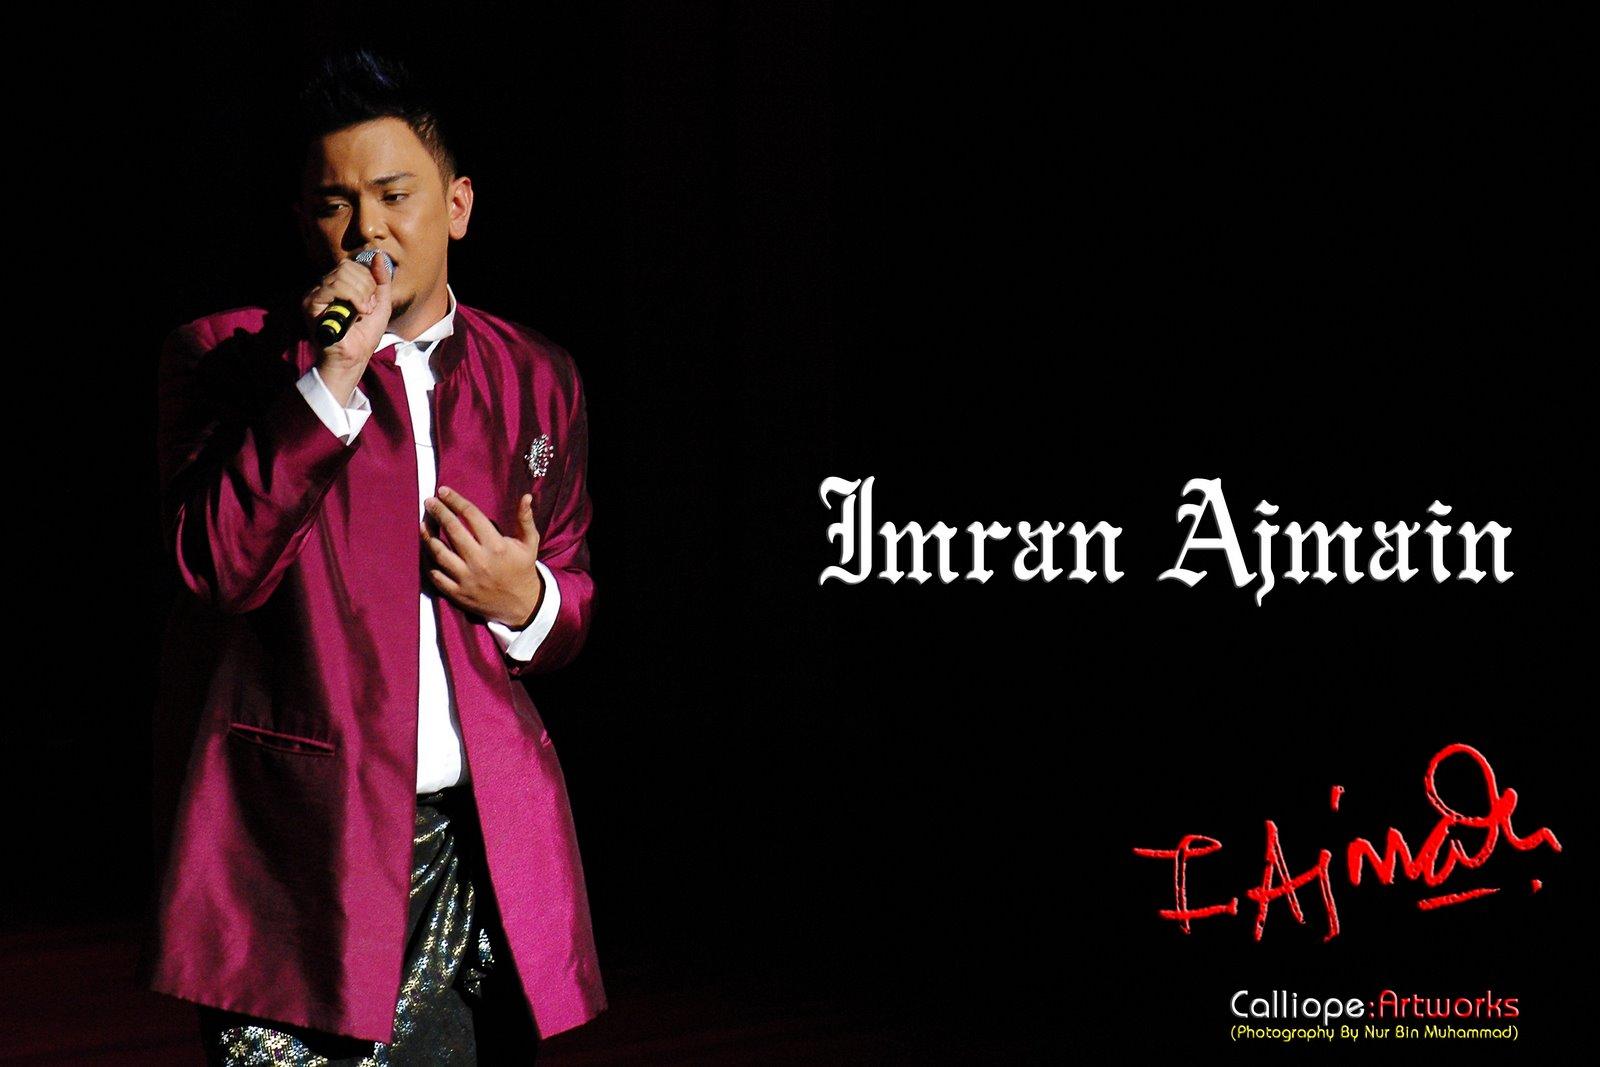 Imran Ajmain Rising Artist